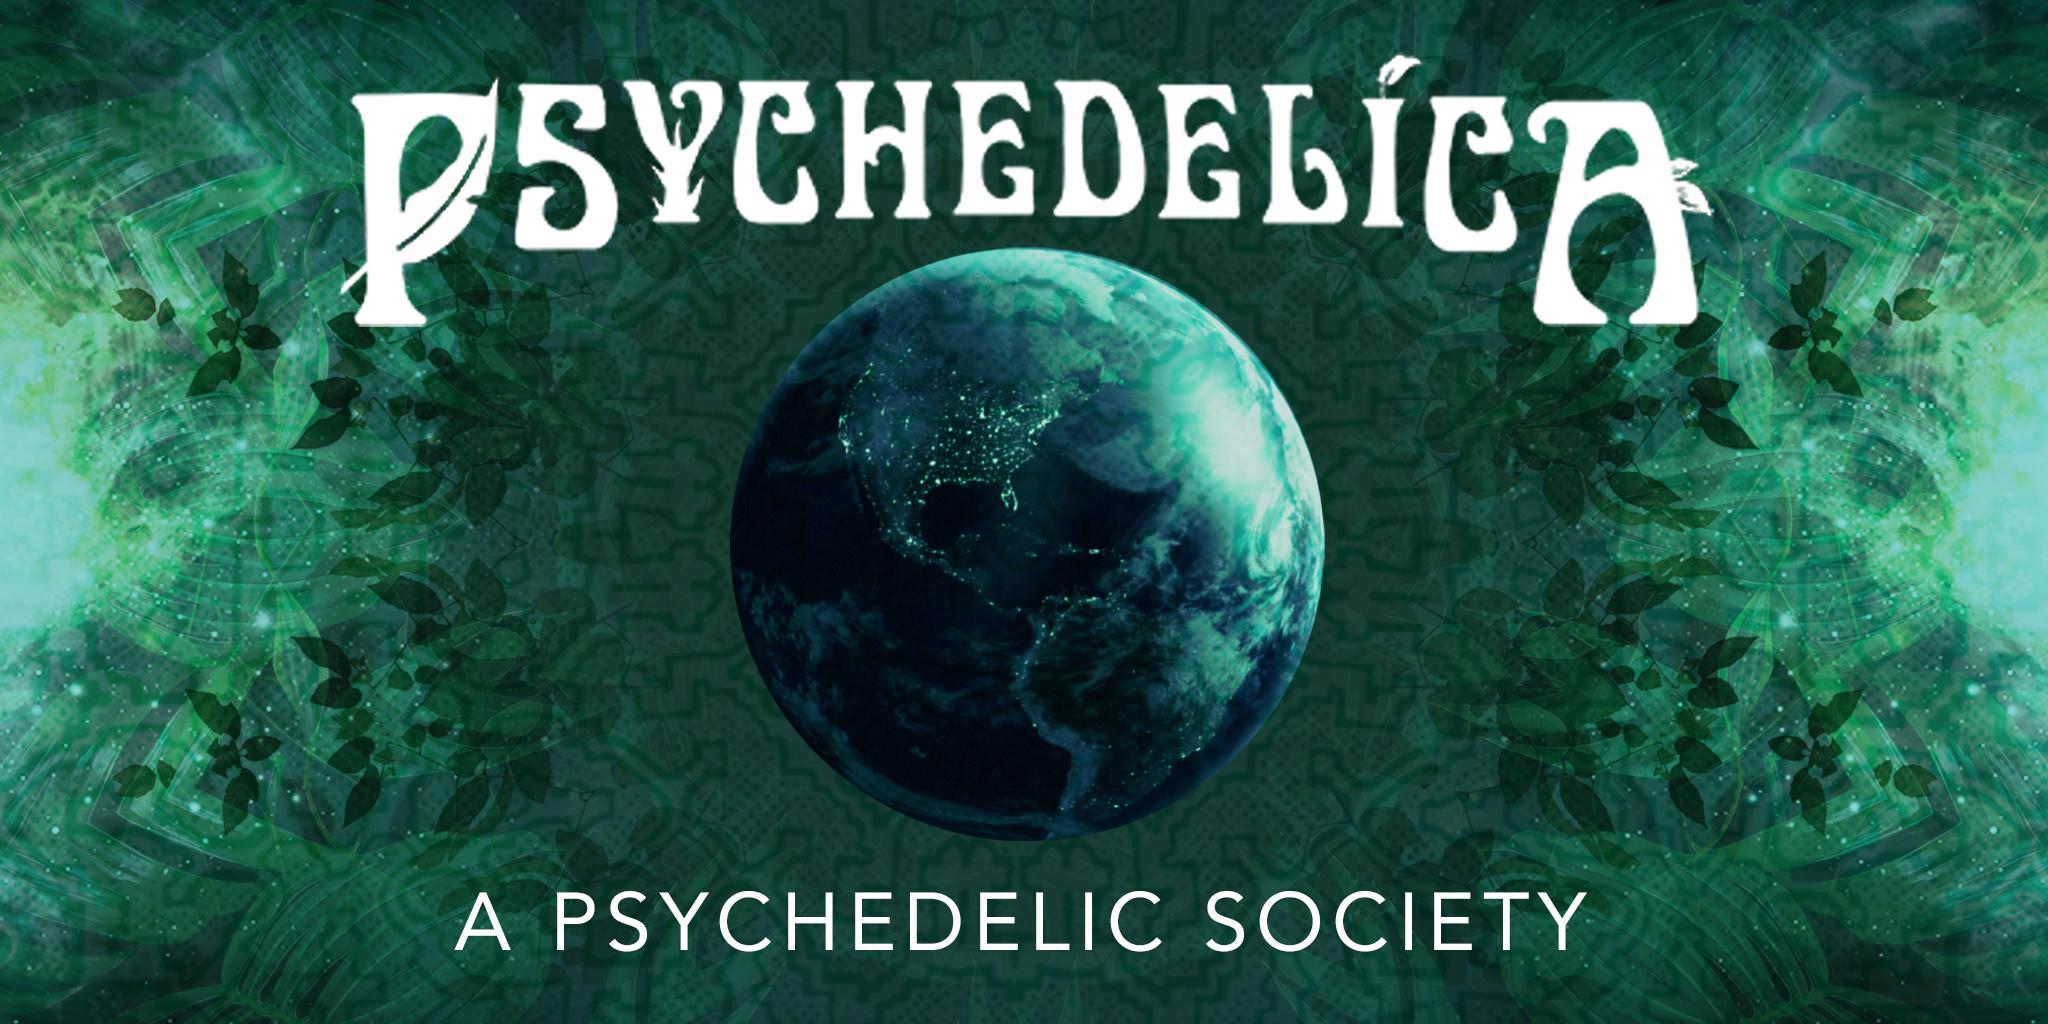 172506_p_e12_a-psychedelic-society_2048x1024.jpg